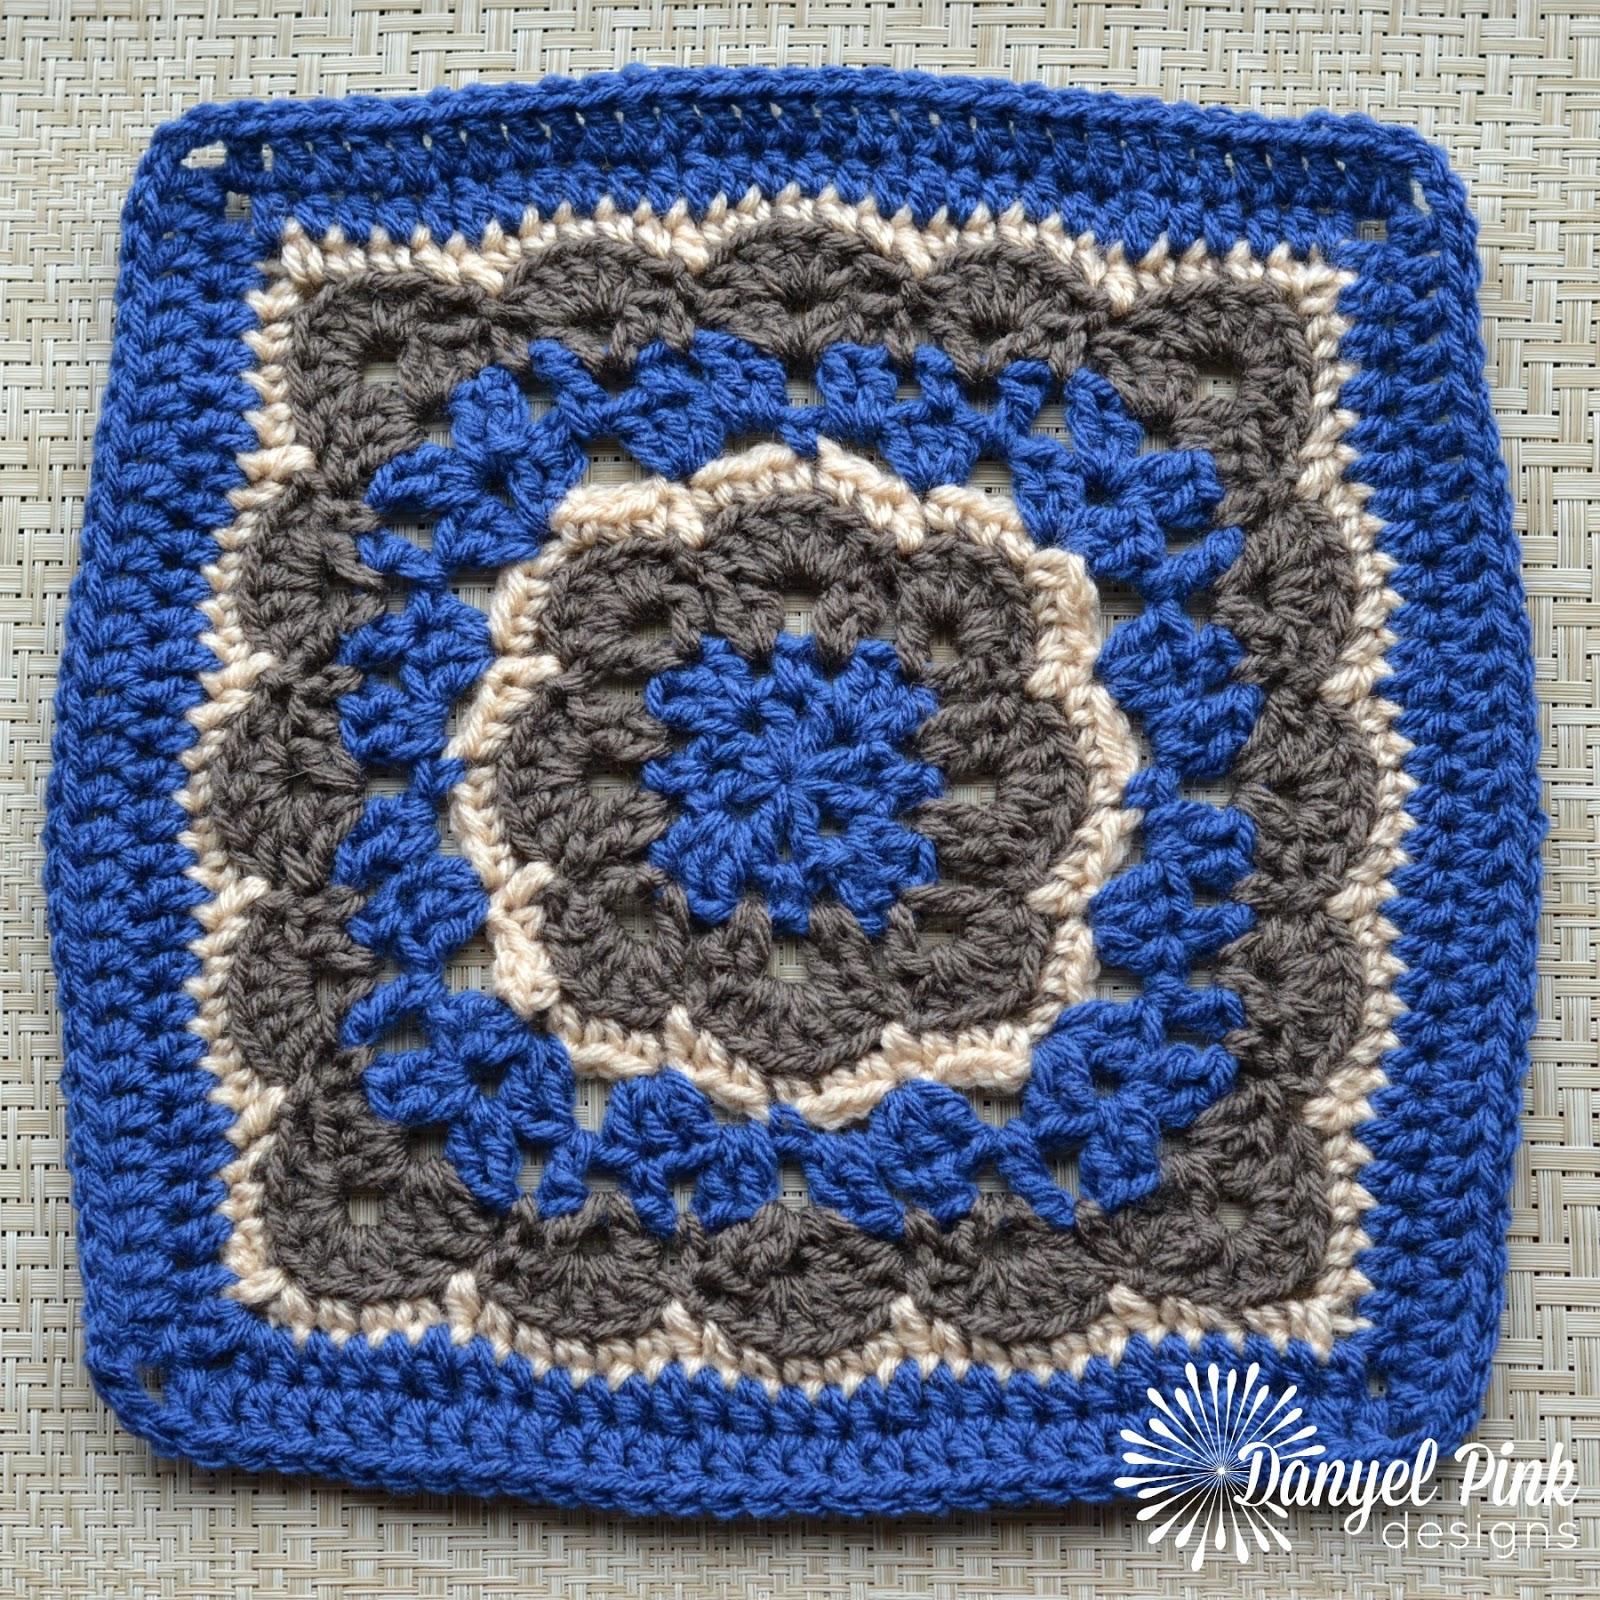 Crochet Pattern For Afghan Squares : Danyel Pink Designs: CROCHET PATTERN - Winter Bloom Afghan ...